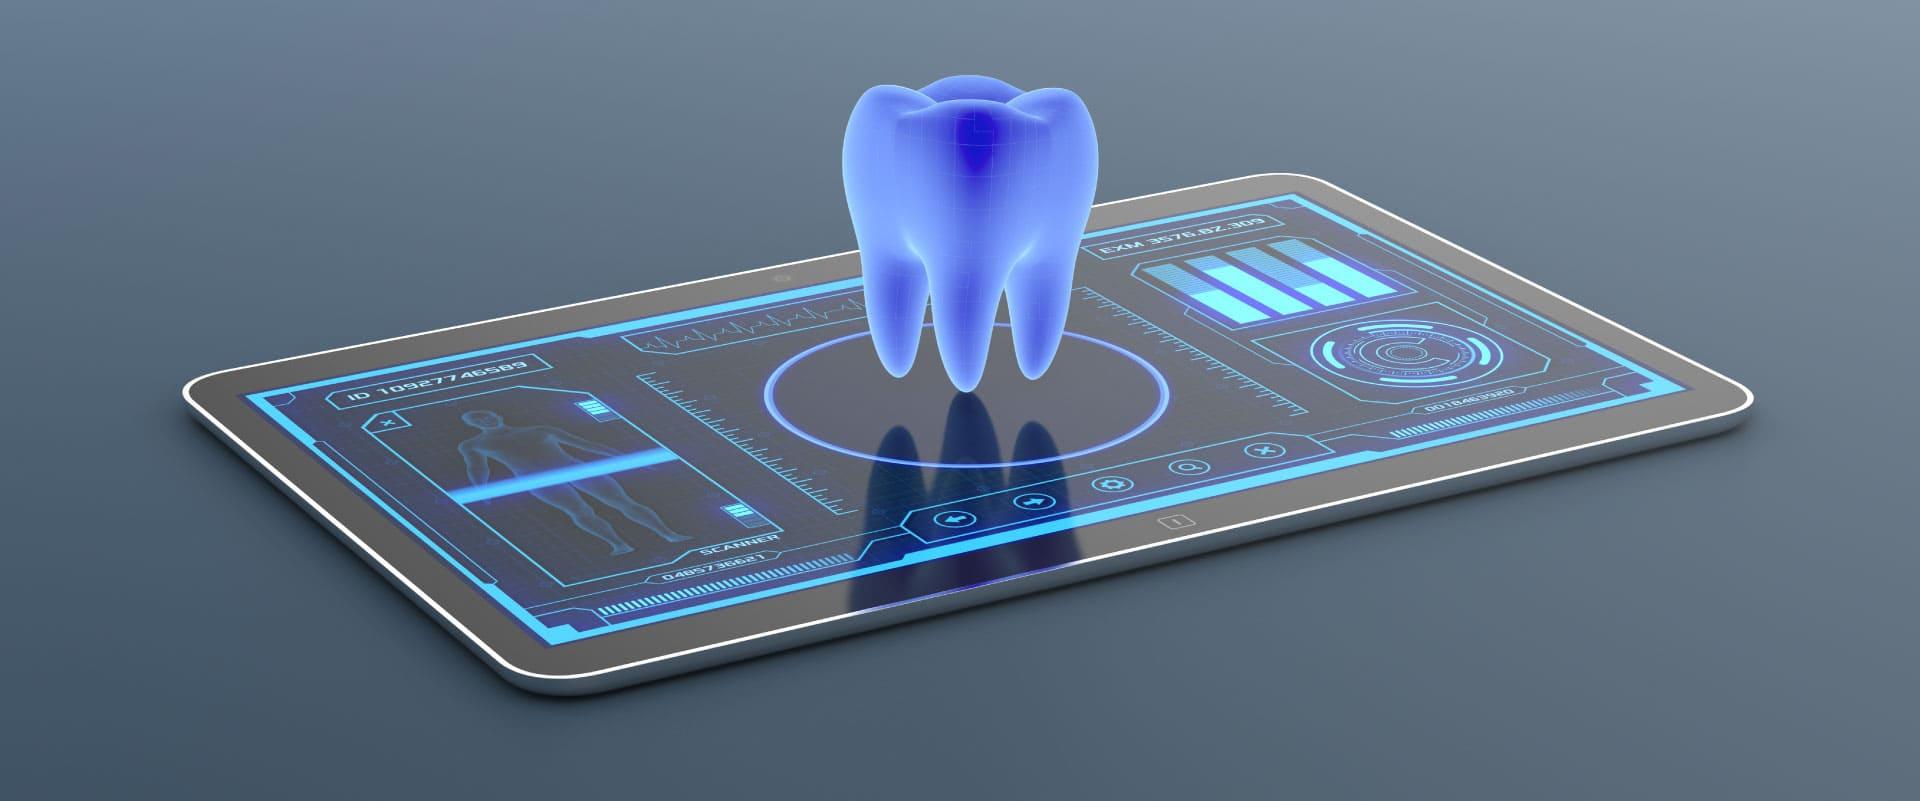 Hightech Zahnmedizin